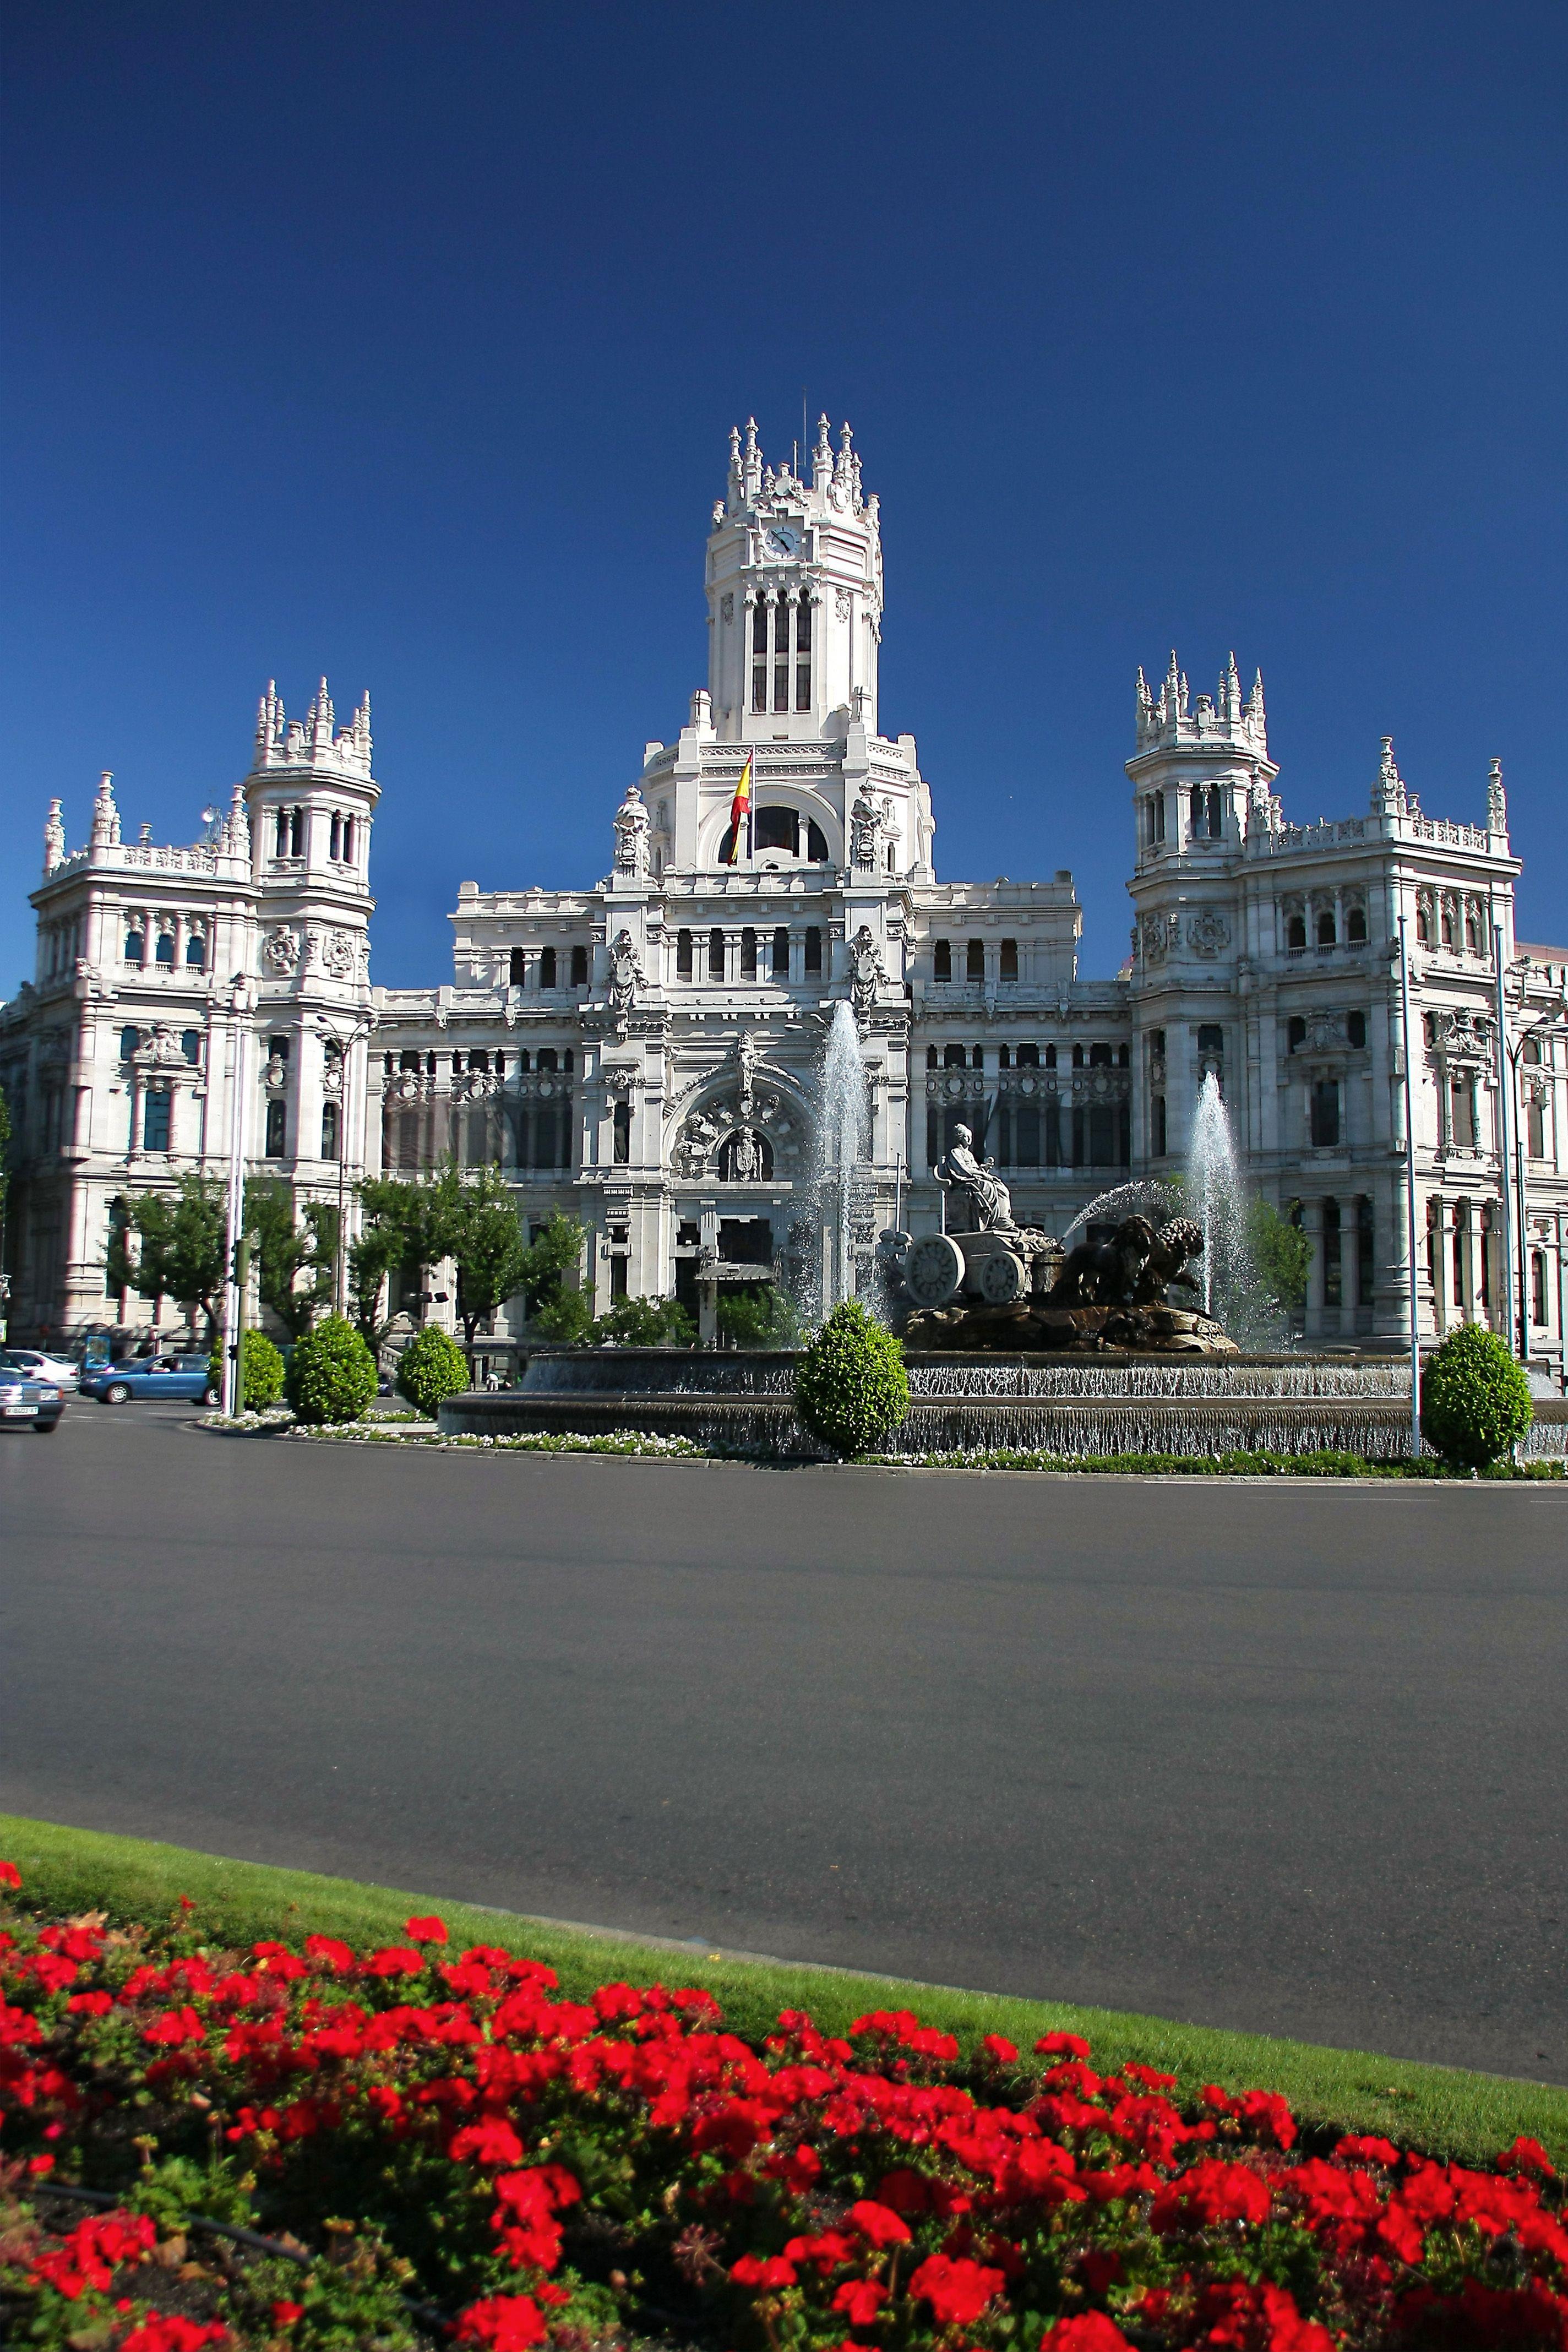 Plaza De Cibeles Madrid Spain Madrid Ciudad Lugares De Espana Viajar Por Espana